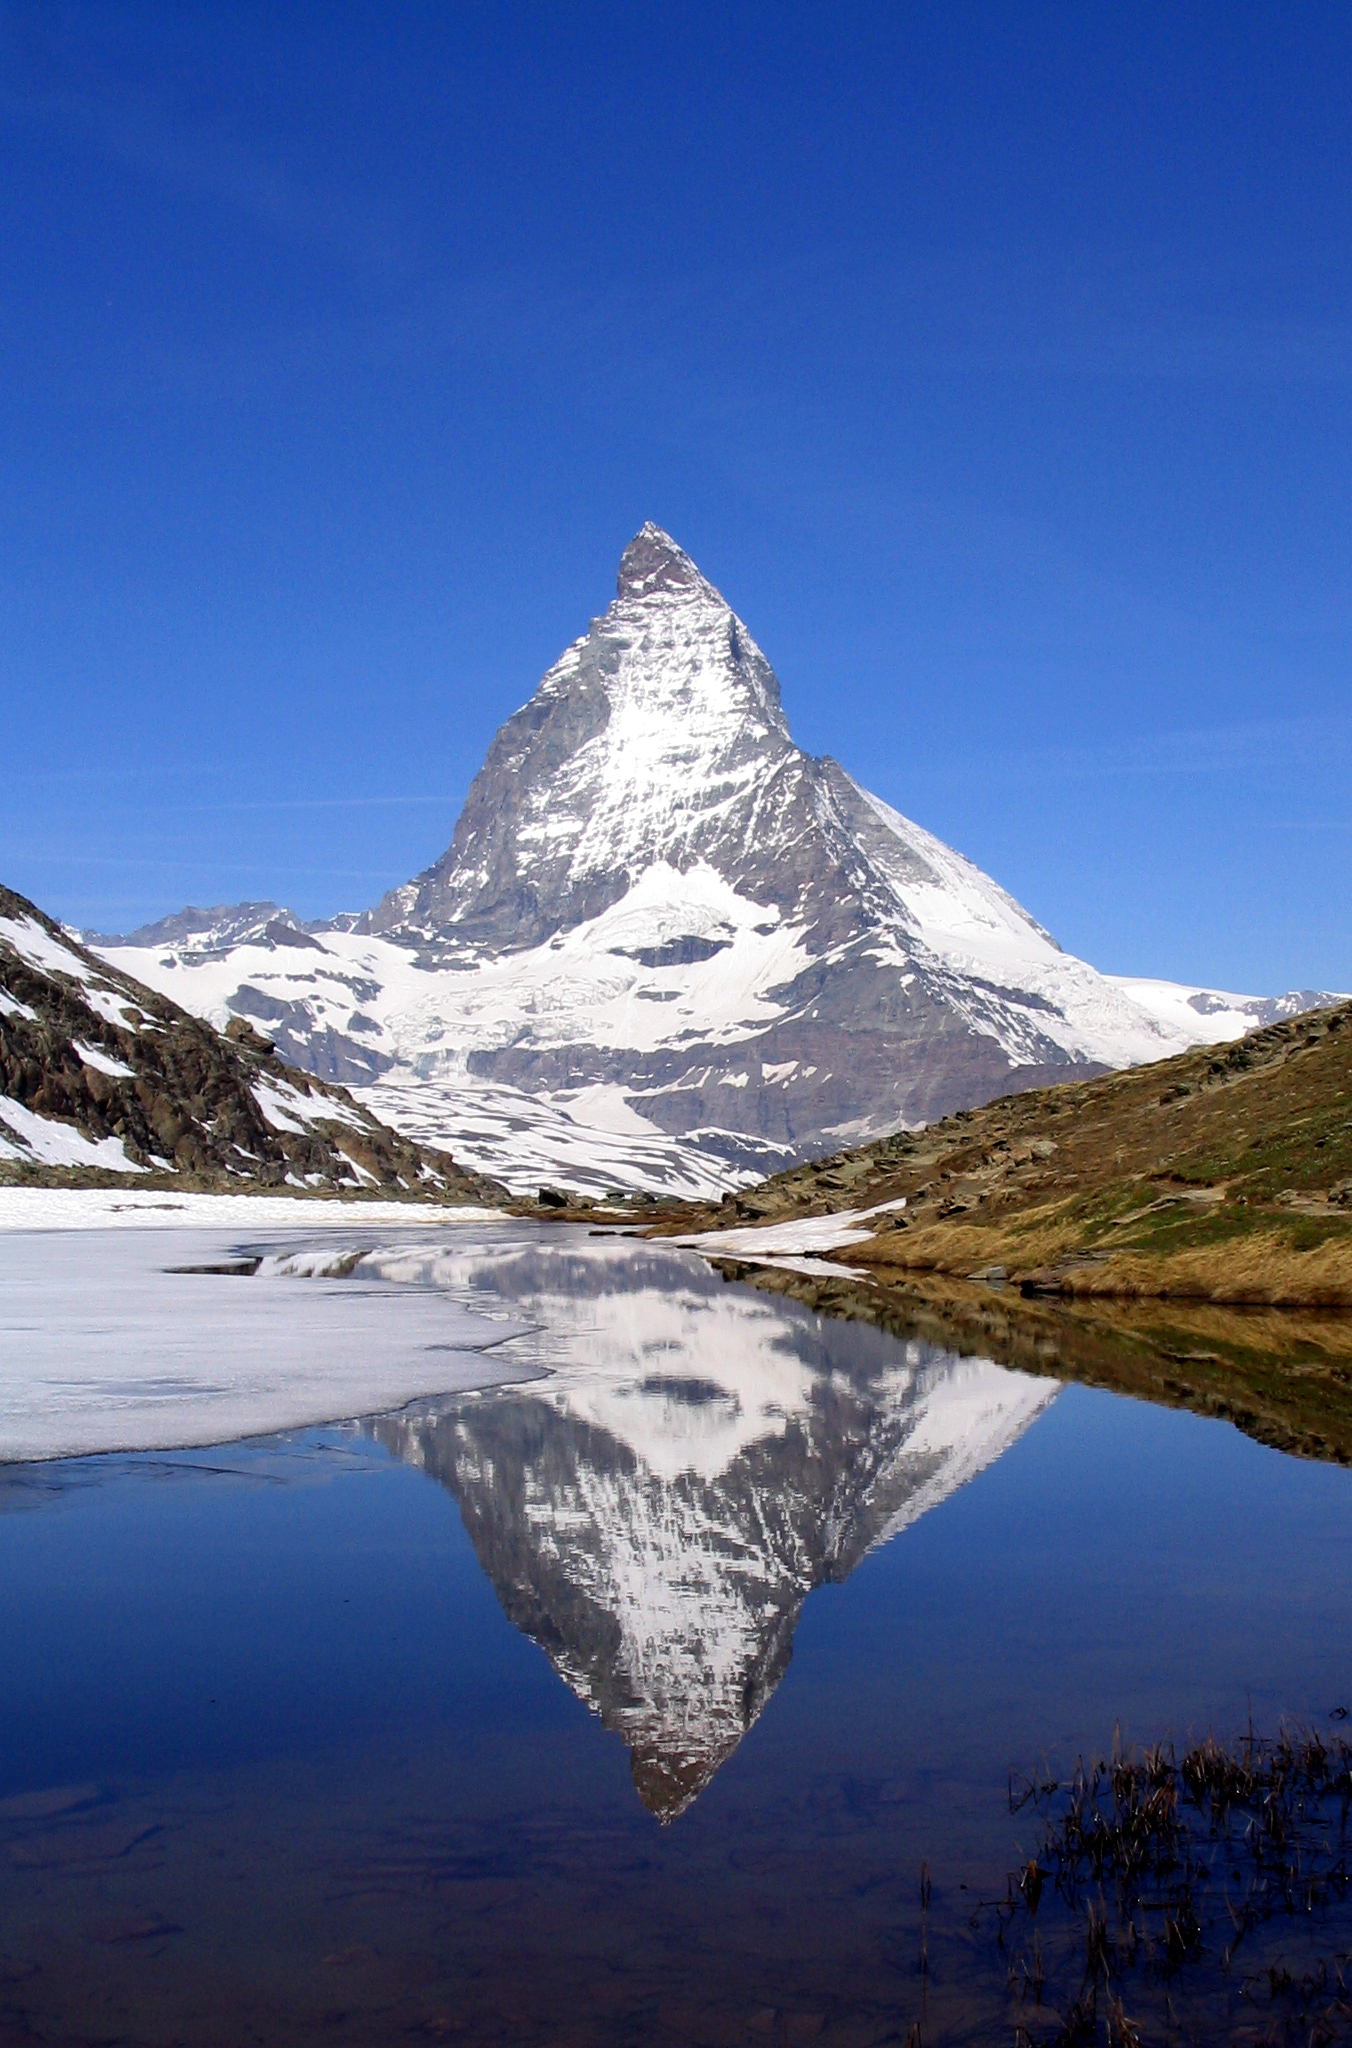 Mountain HD wallpapers, Desktop wallpaper - most viewed